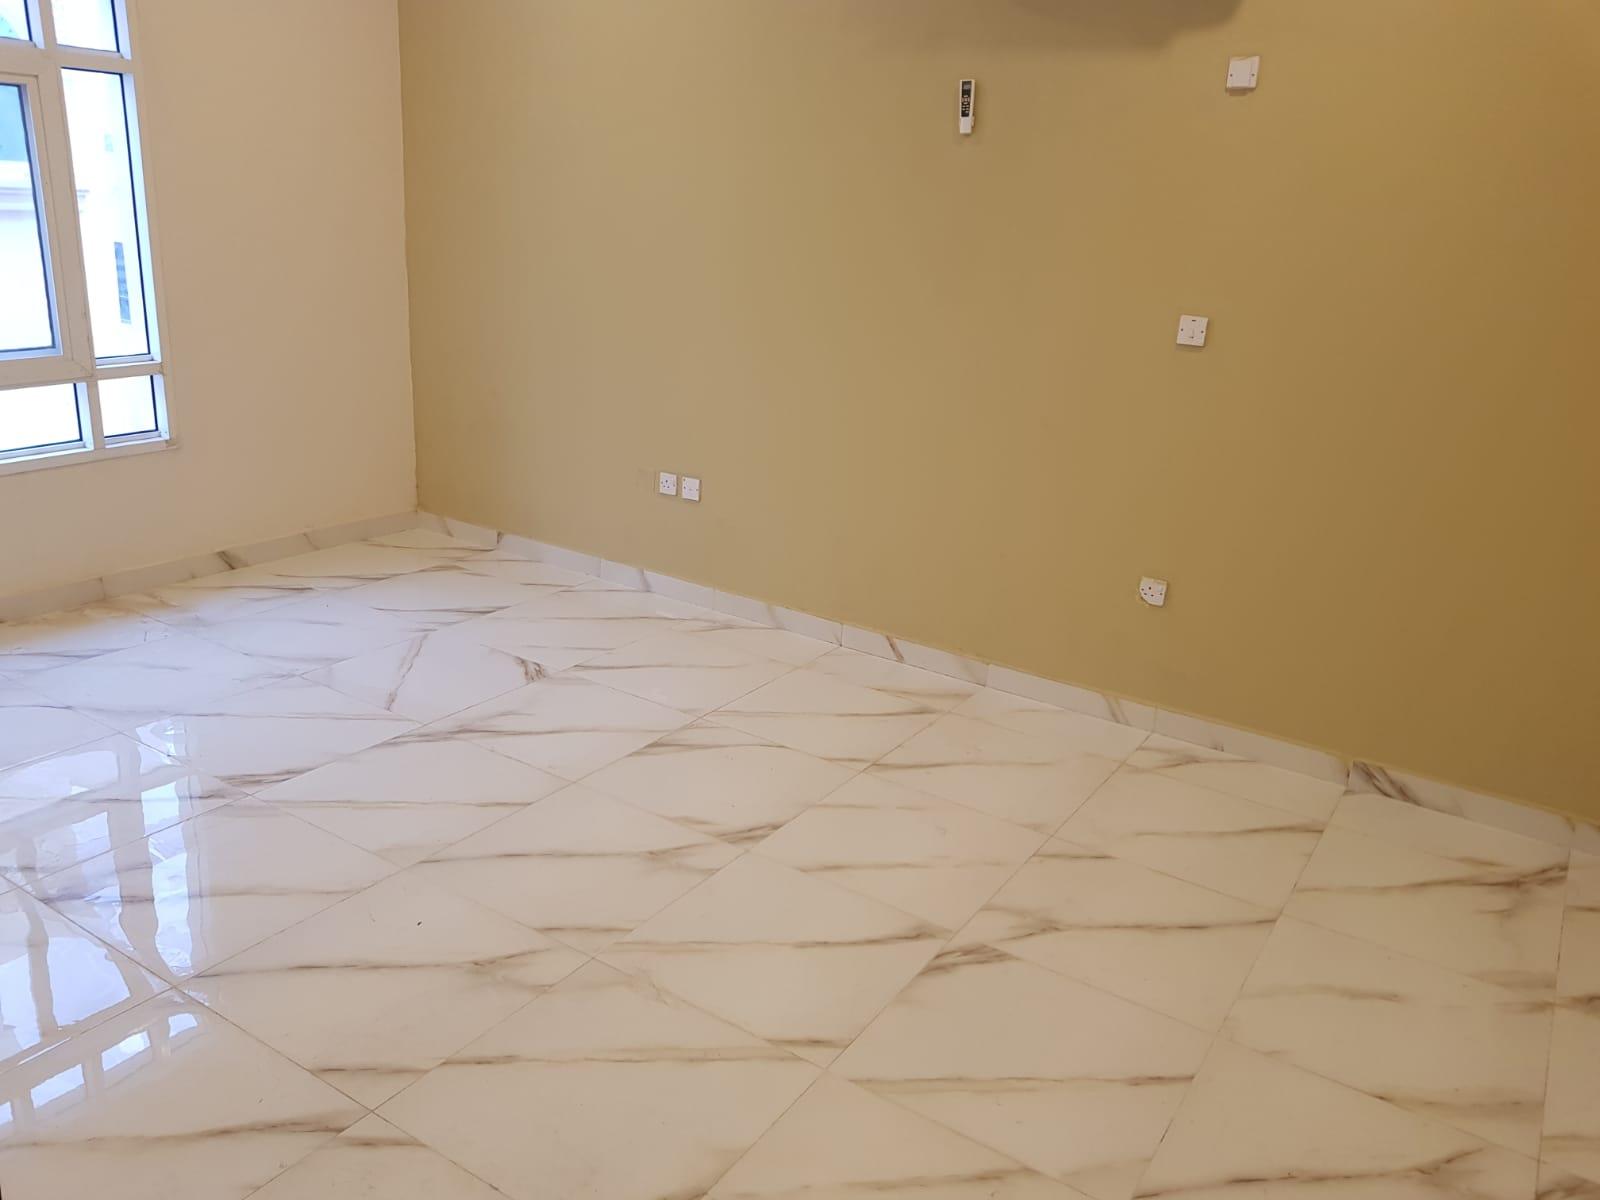 UNBEATABLE OFFER !! close to IKEA  huge 5 bedrooms villa for rent in Jeryan Jenaihat (Al Kheesa)